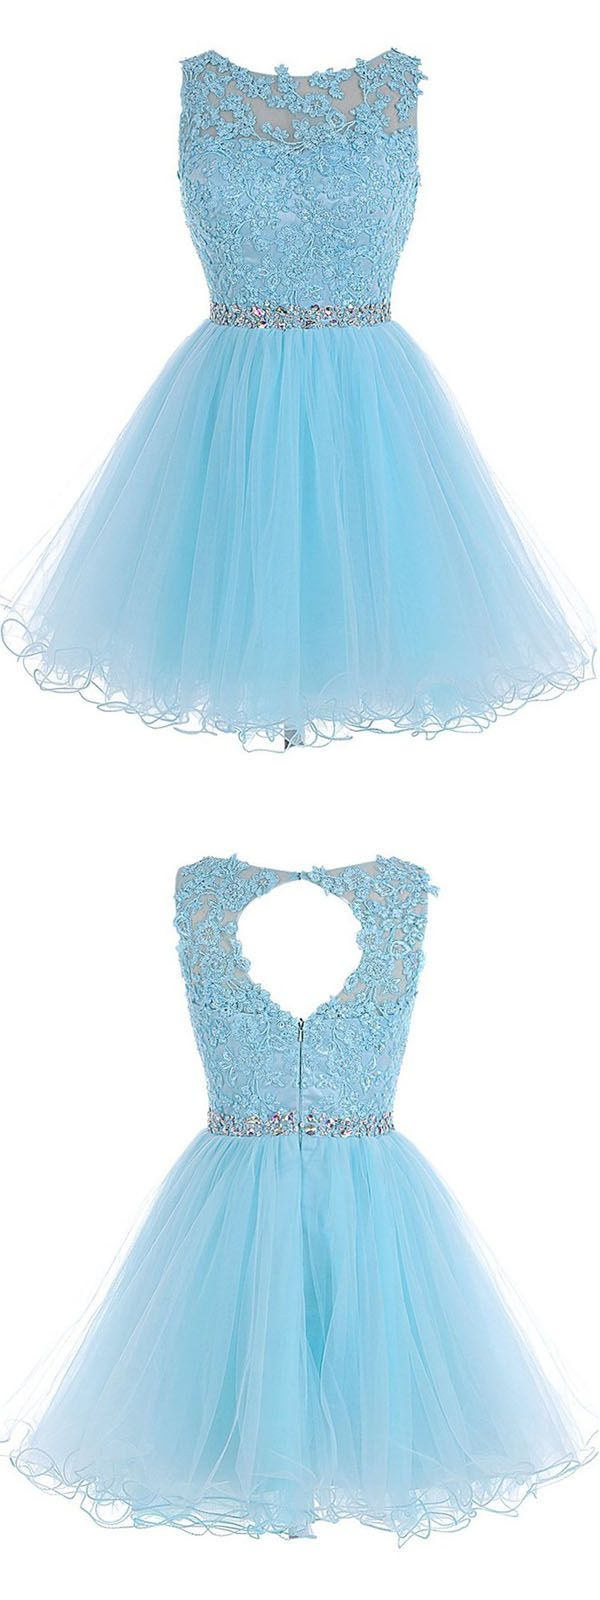 A-line Scoop Short Blue Zipper-up Organza Homecoming Dress With Appliques…